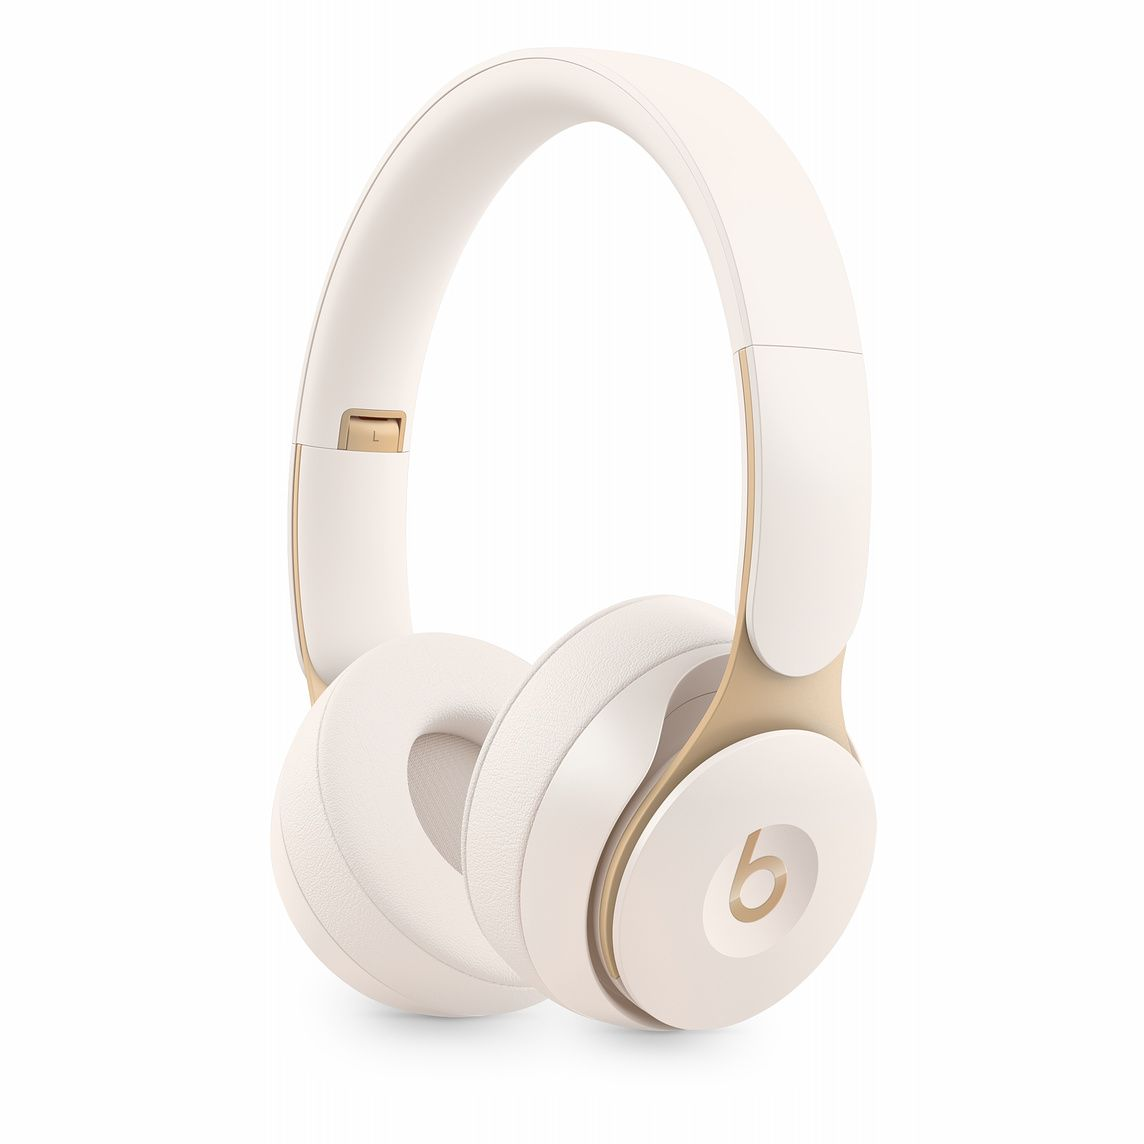 Beats Solo Pro Wireless Noise Cancelling Headphones More Matte Collectio Noise Cancelling Headphones Wireless Noise Cancelling Headphones Wireless Headphones